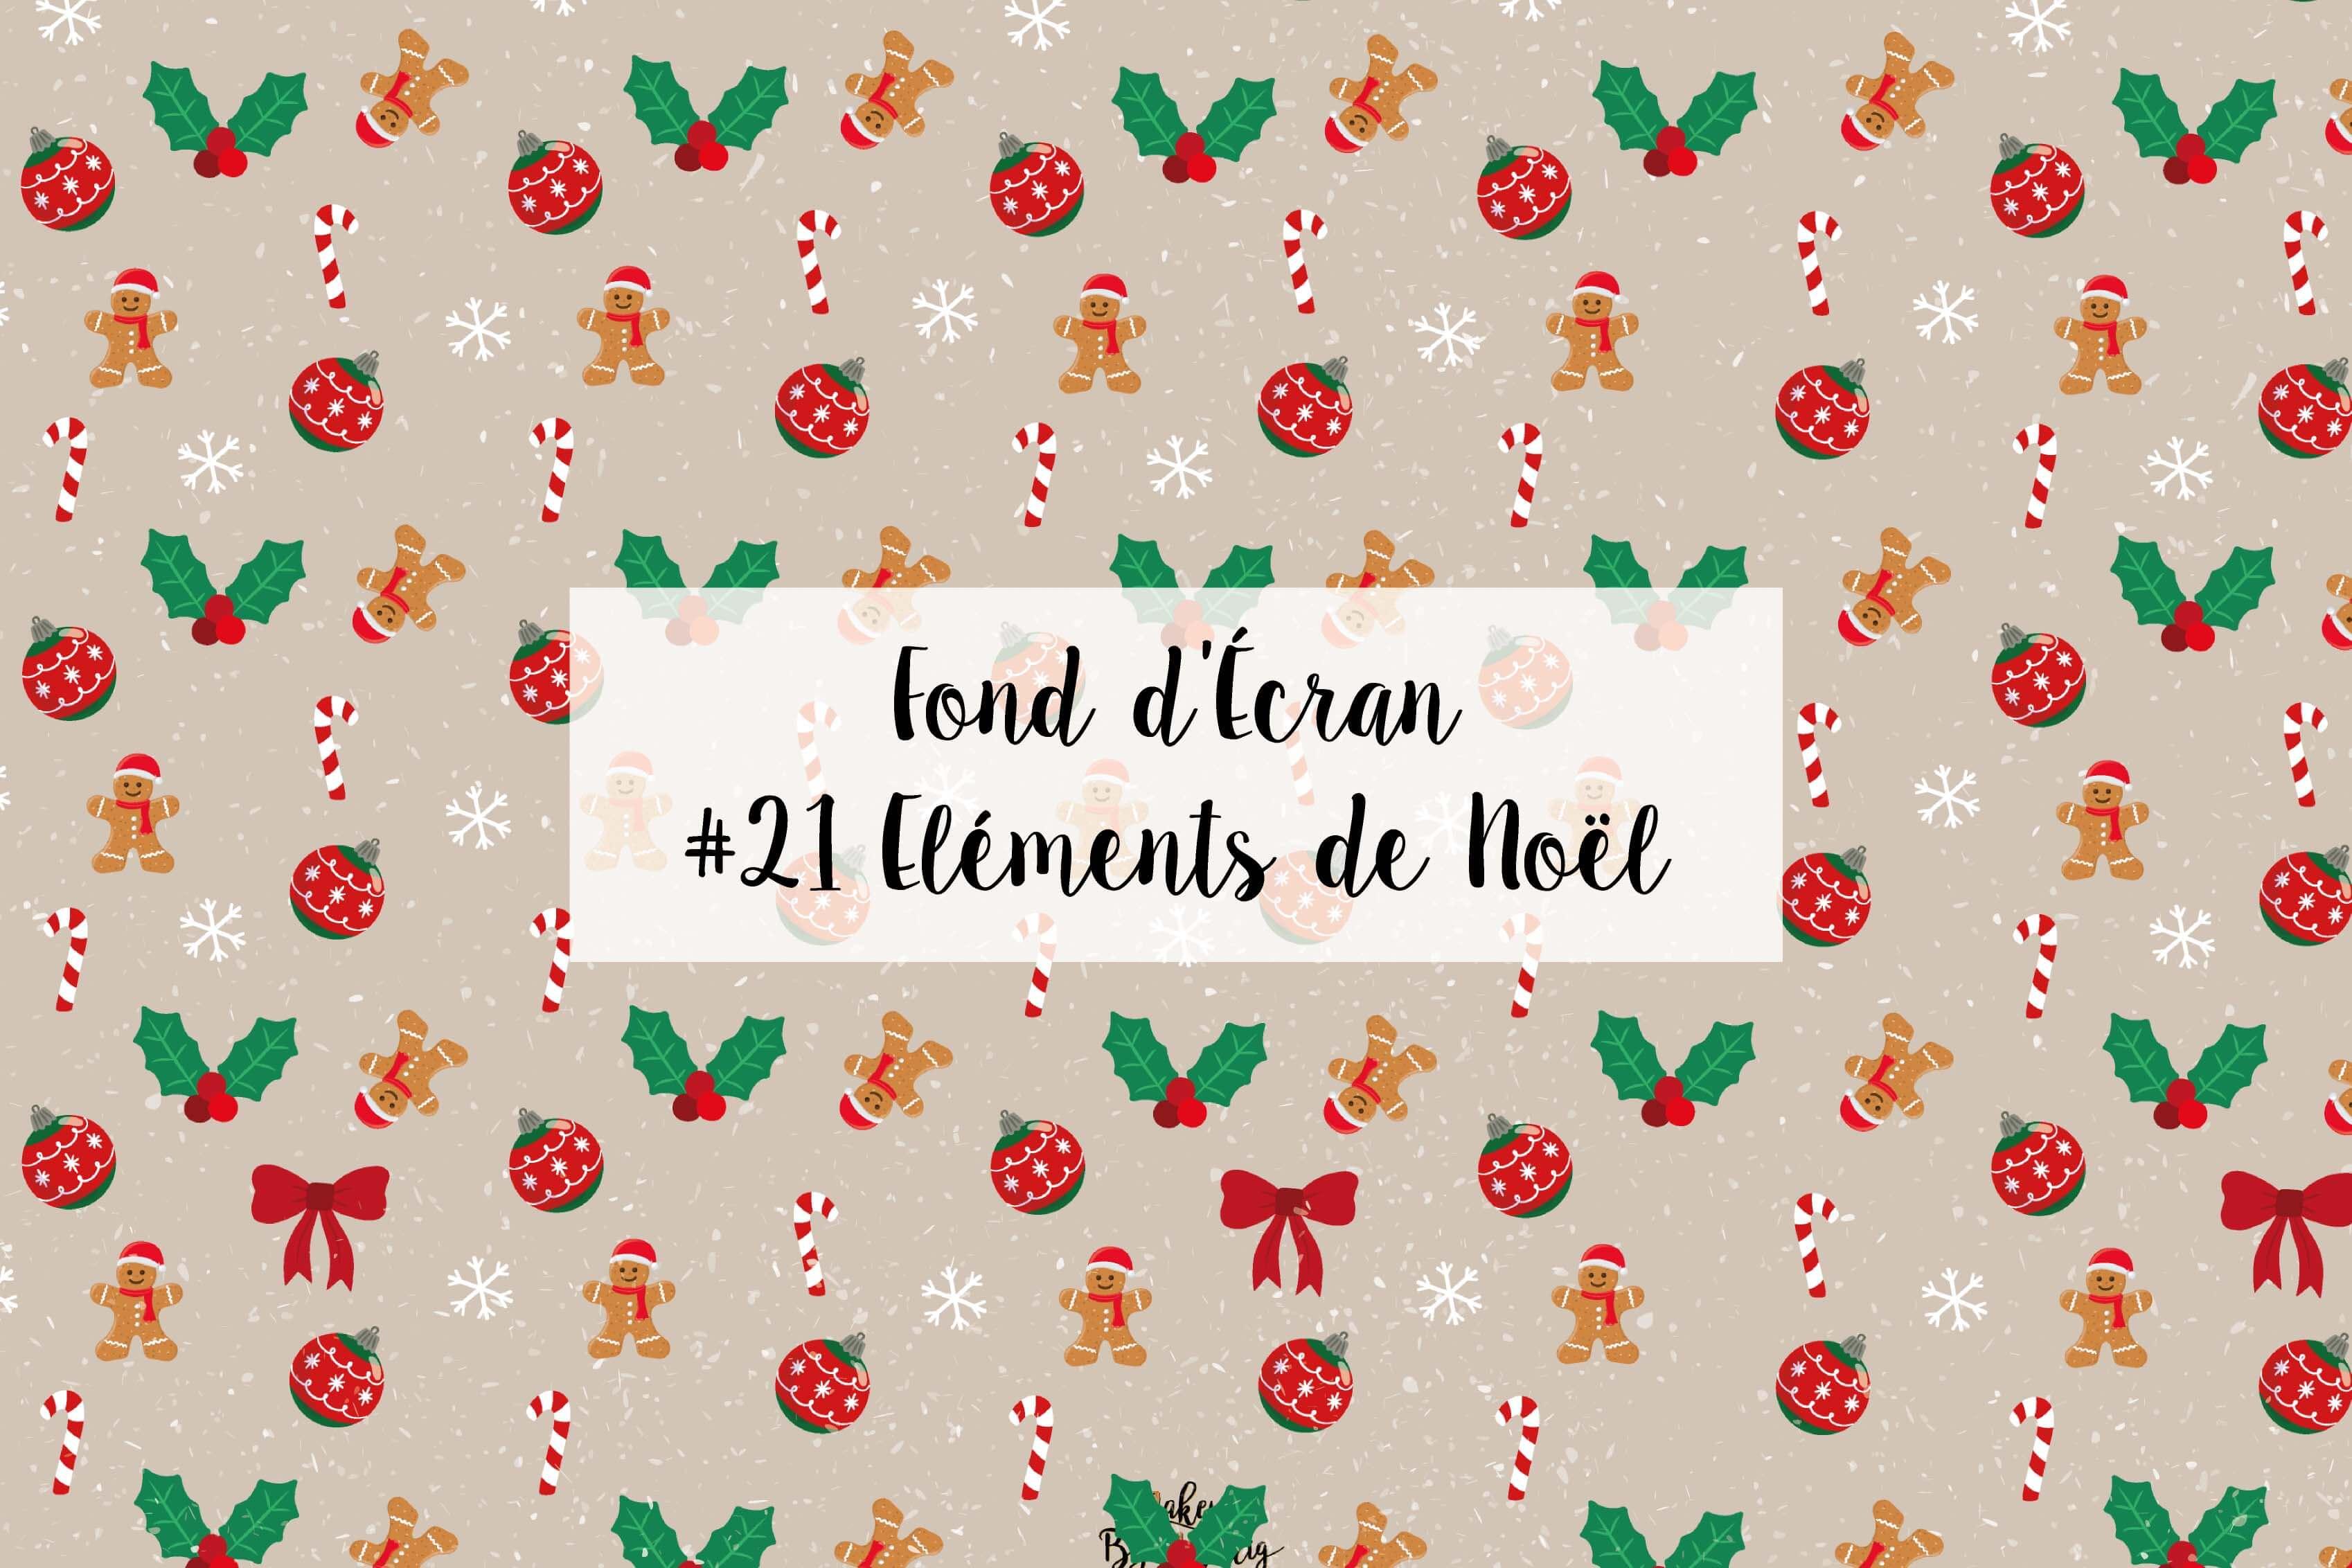 fond-decran-wallpaper-christmas-noel-elements-gingerbread-houx-decoration-december-ordinateur-iphone-samsung-mac-macbook-imac-pc-makeupbyazadig-miniature